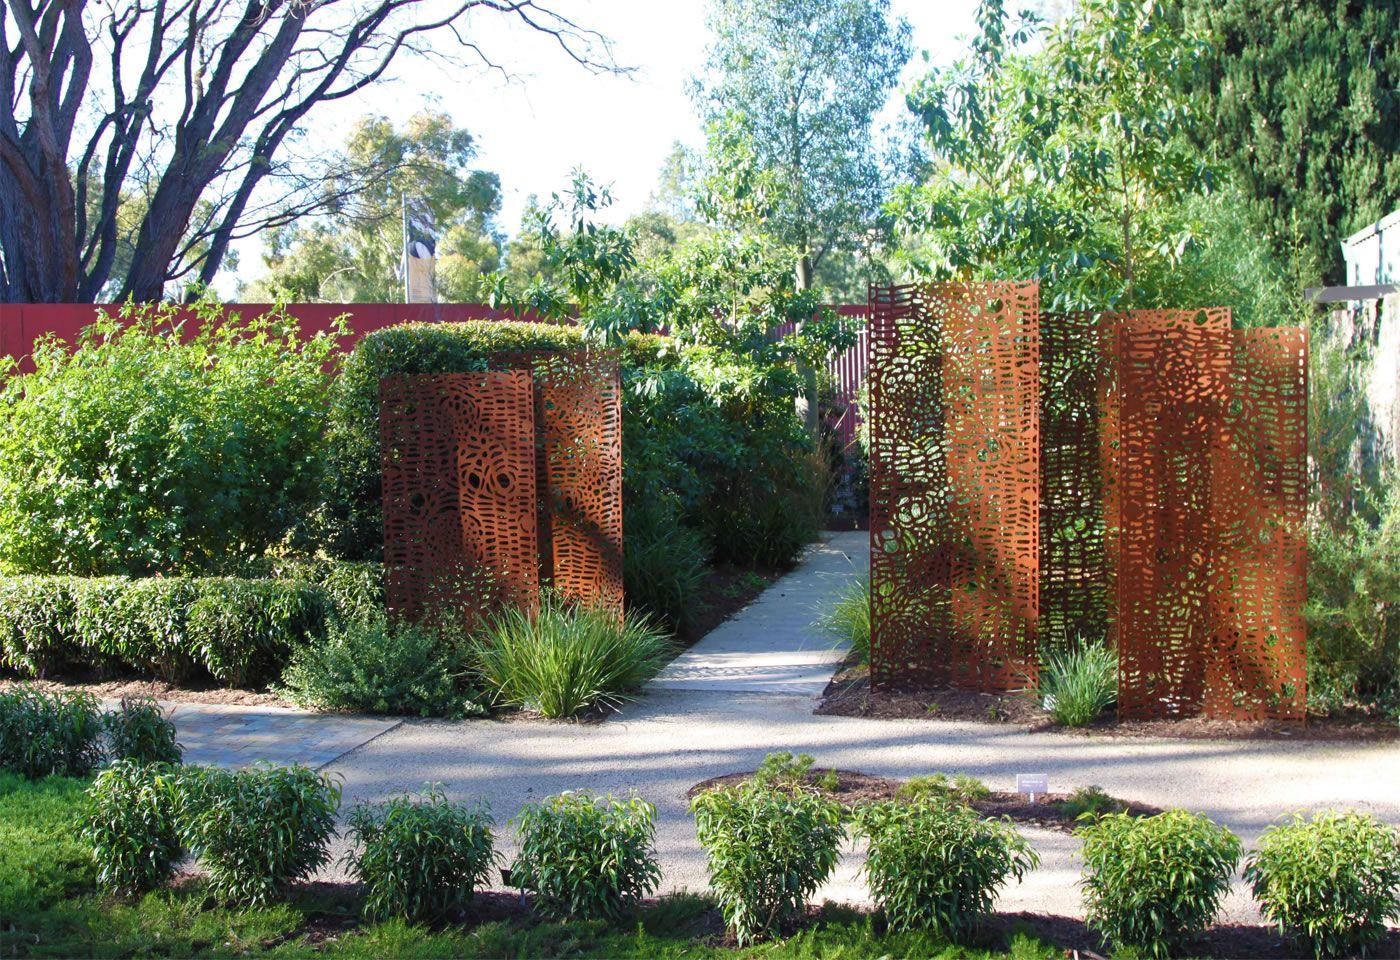 Taylor Cullity Lethlean / Native Garden, Adelaide Botanic